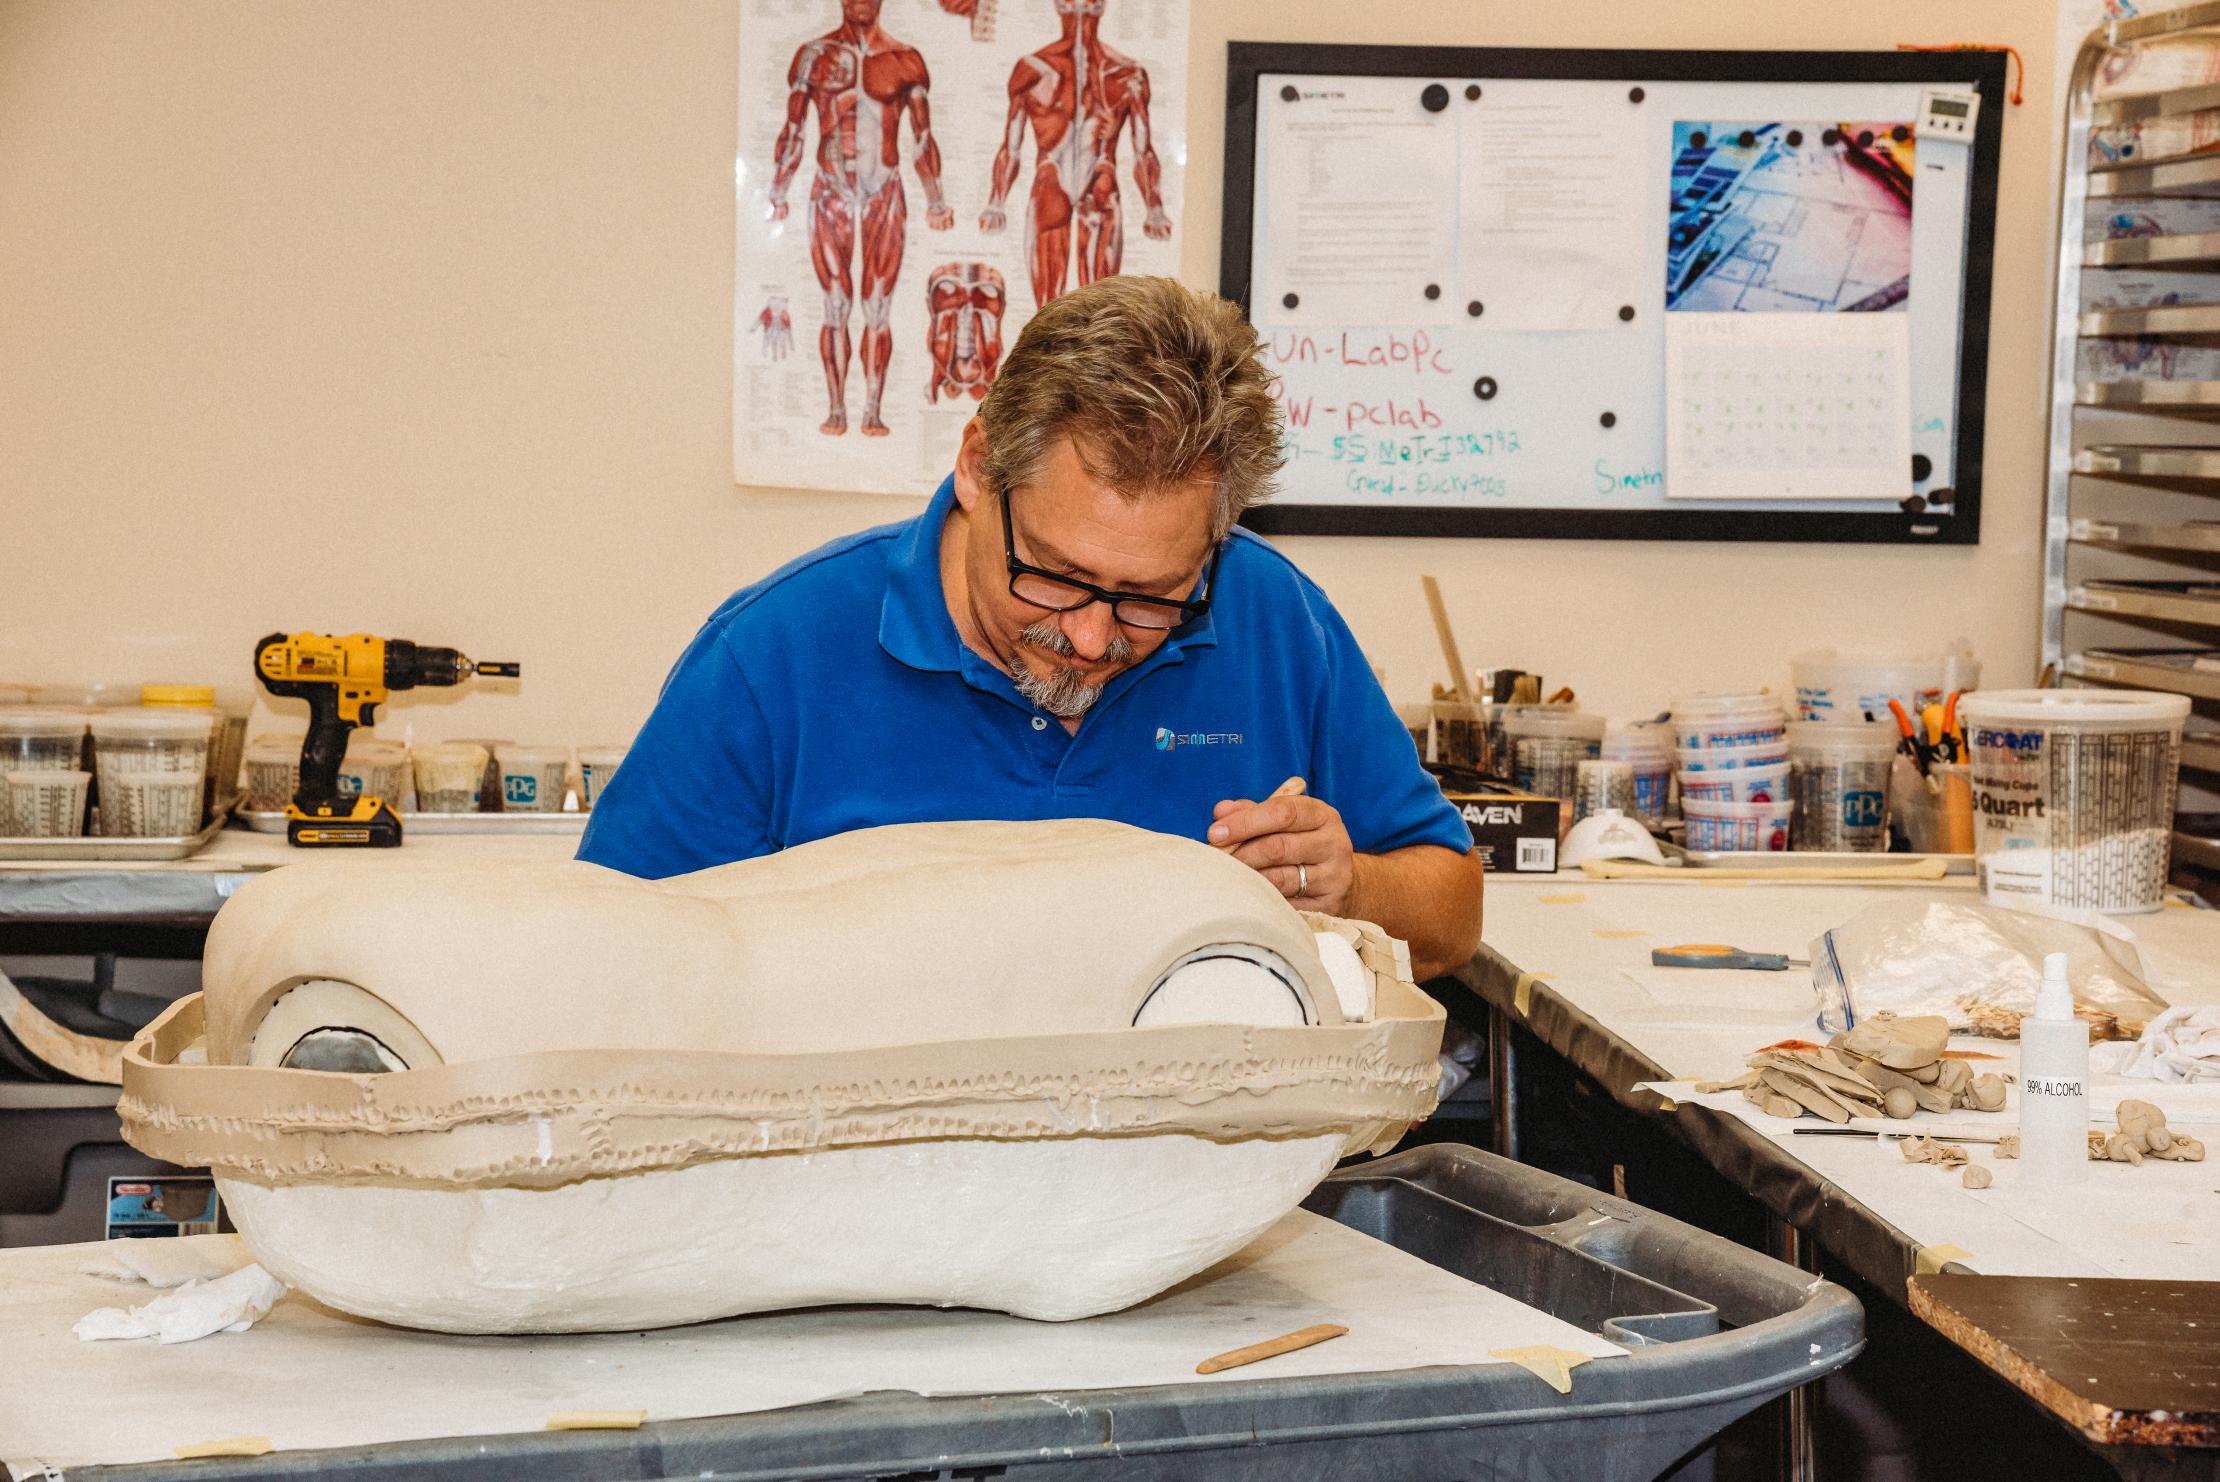 SIMETRI Special Effects Director Barry Anderson sculpts a medical simulation training manikin.